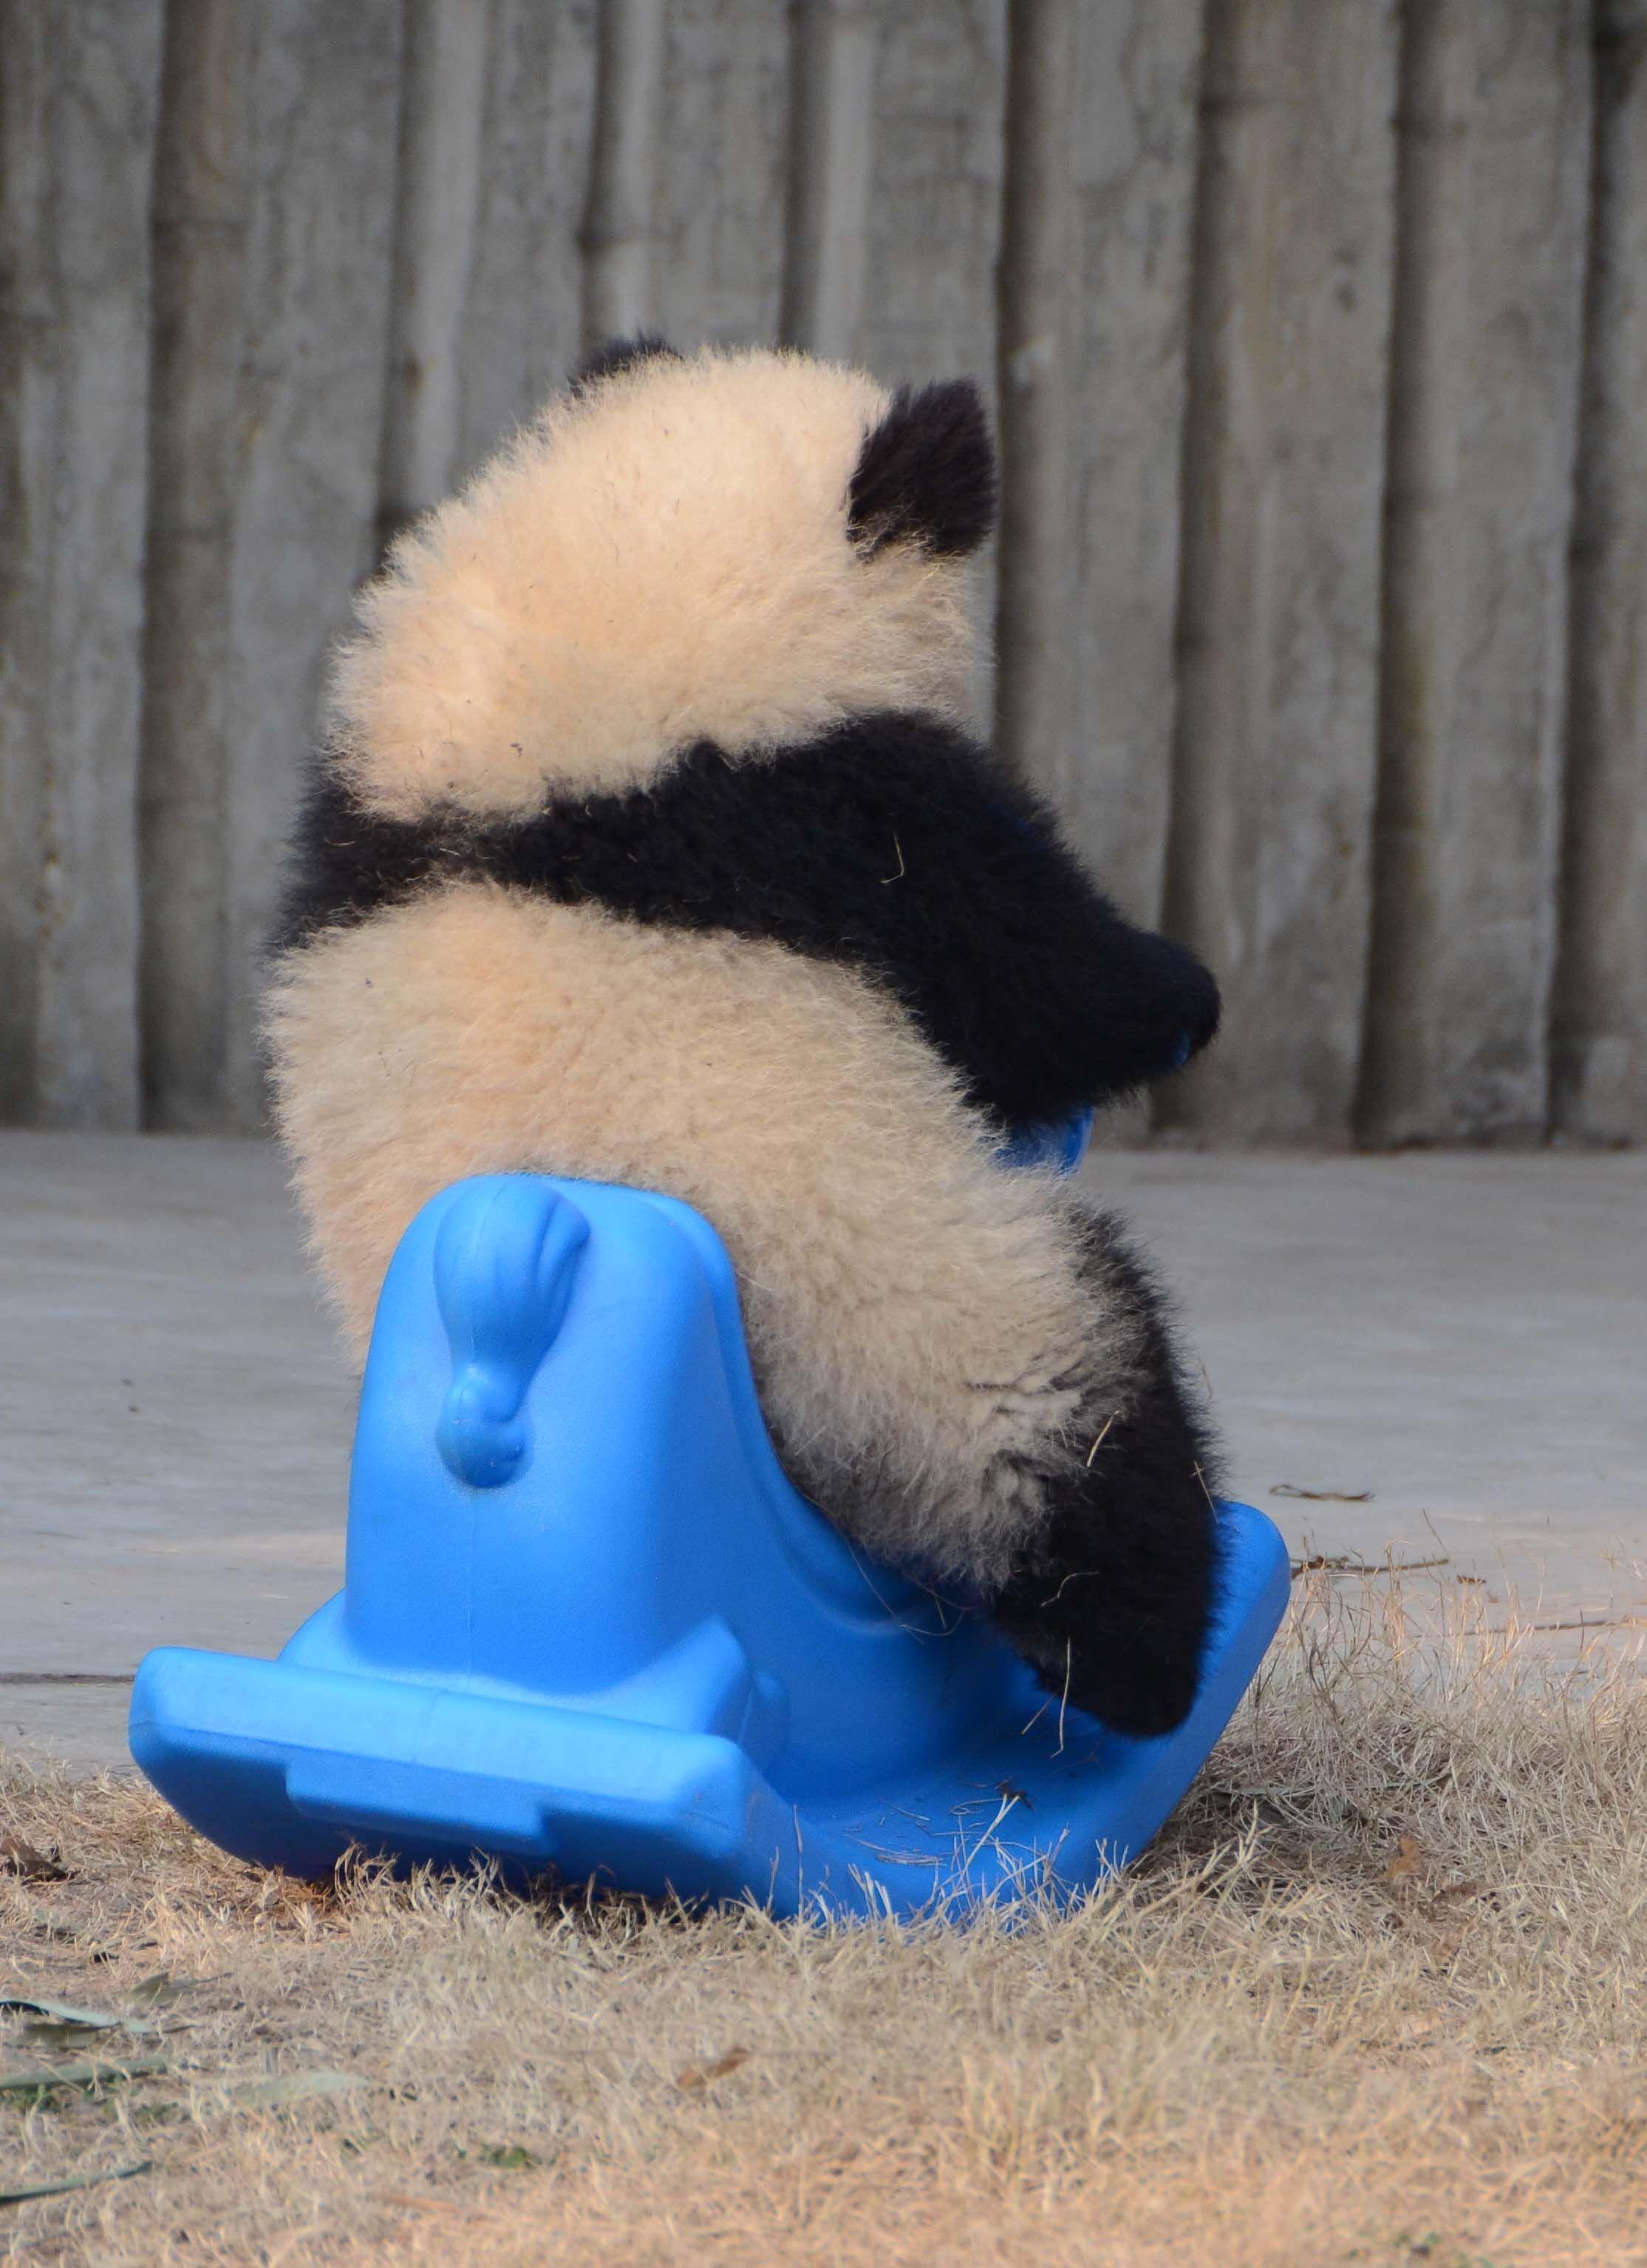 Baby panda in Cheng Du - taken by Trudi Convey #babypandas